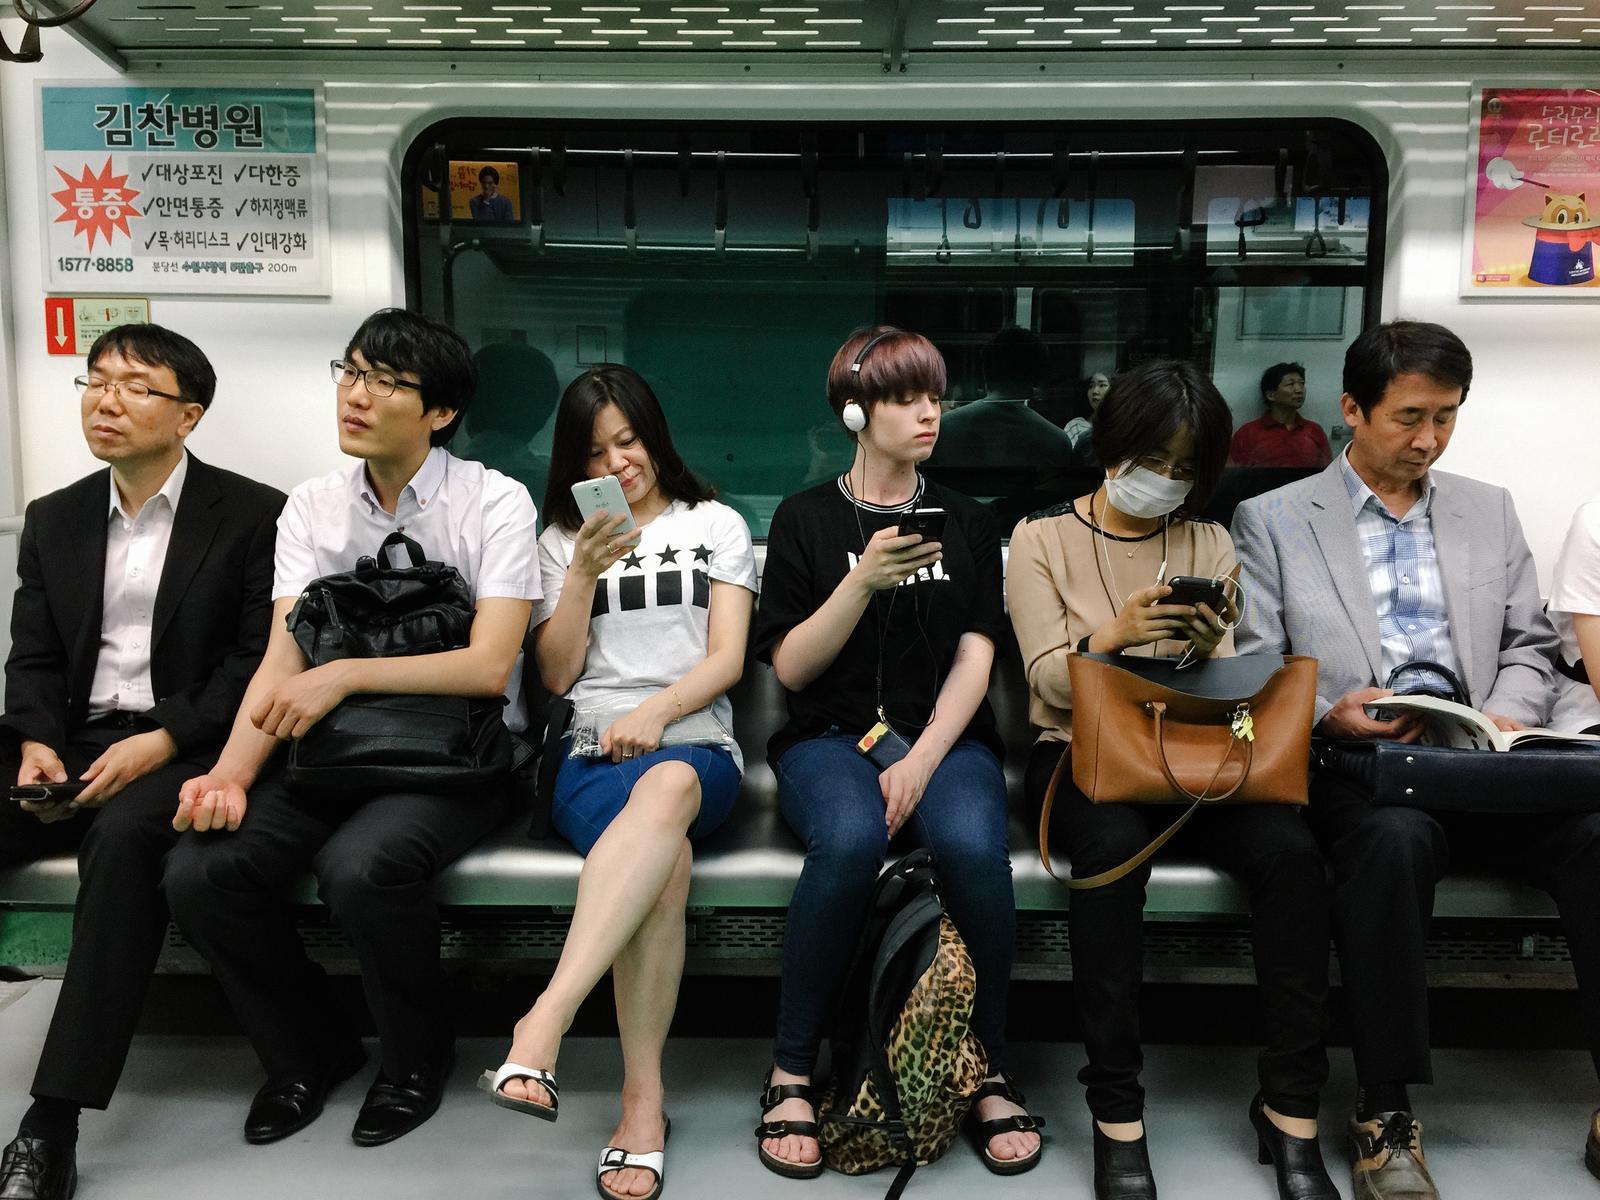 Leseliste Seoul U-Bahn Start alt 06122015